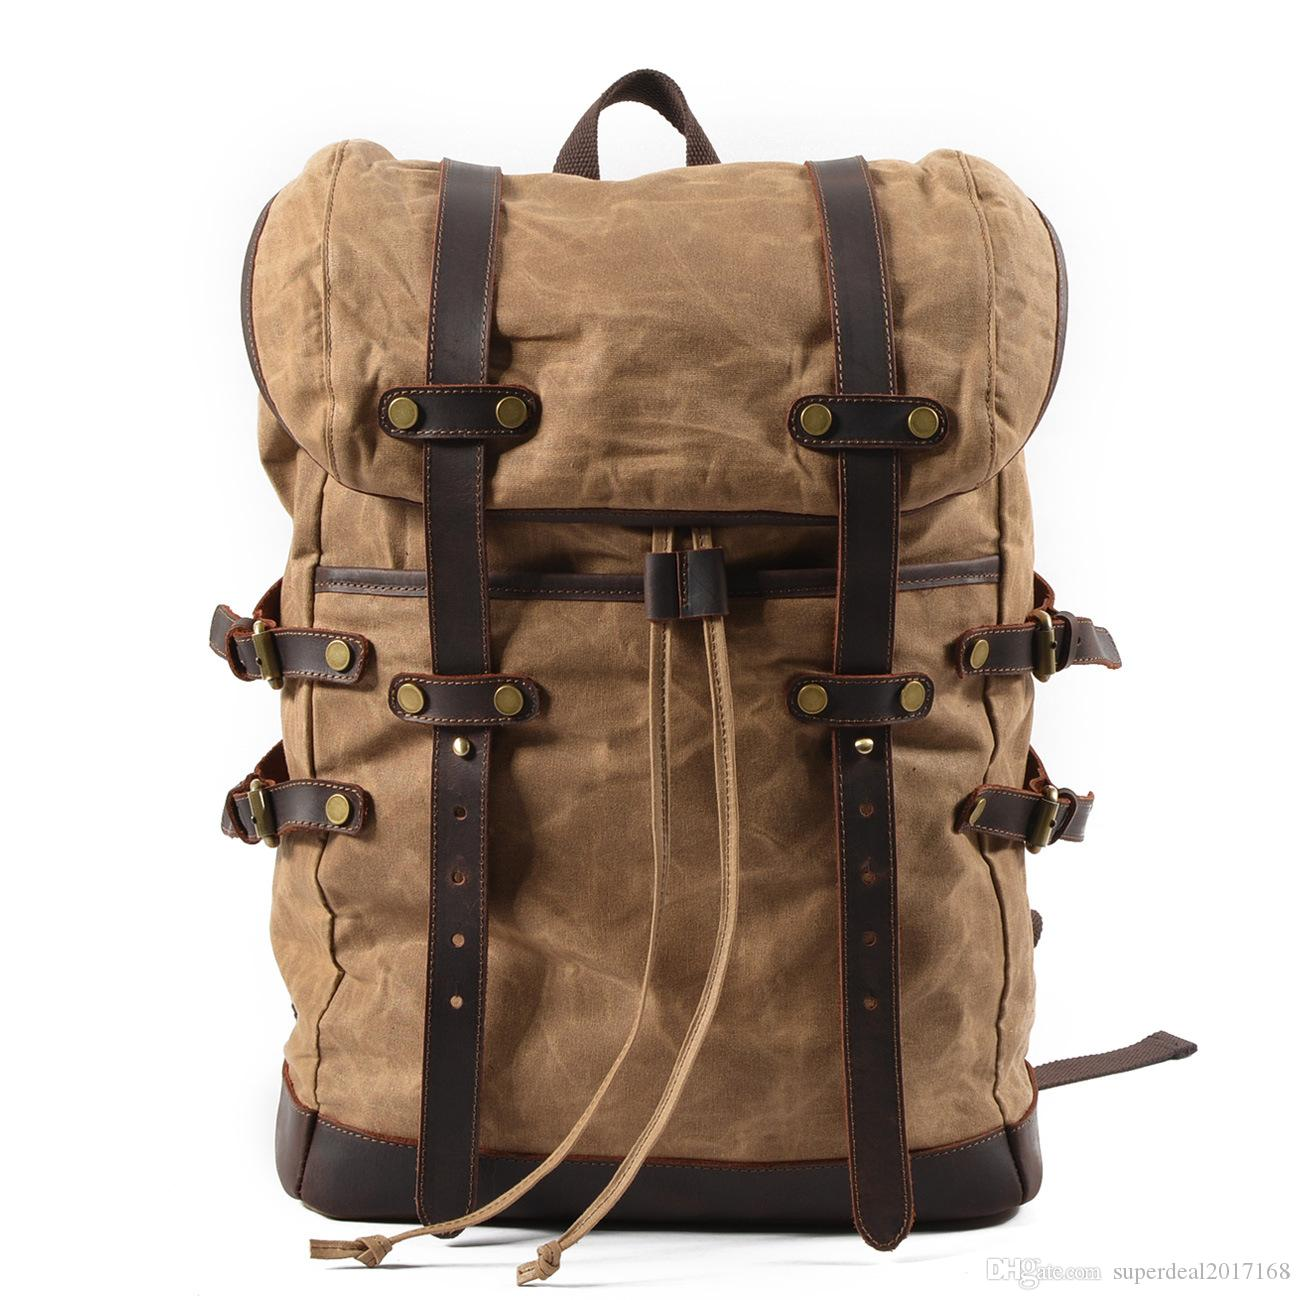 b56d977e78a7 New Arrival Unisex Vintage Oil Wax Canvas Backpack Travel Bag School Bag  Rucksack Satchel Outdoor Camping Hiking Bag Pack Back Pack Mochilas  Jansport From ...